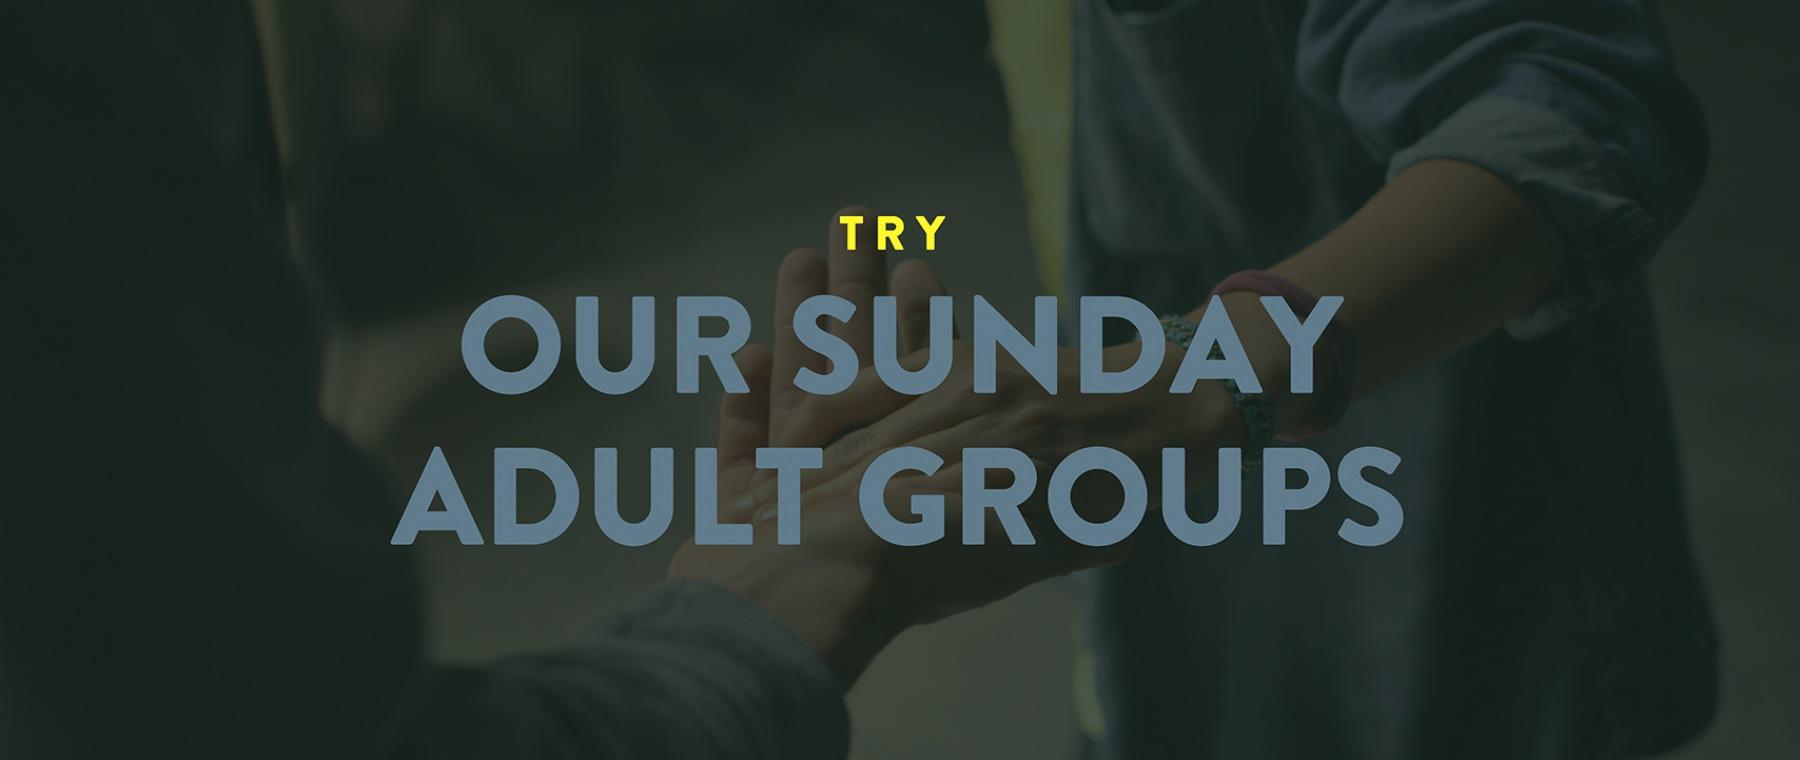 Sunday Adult Groups